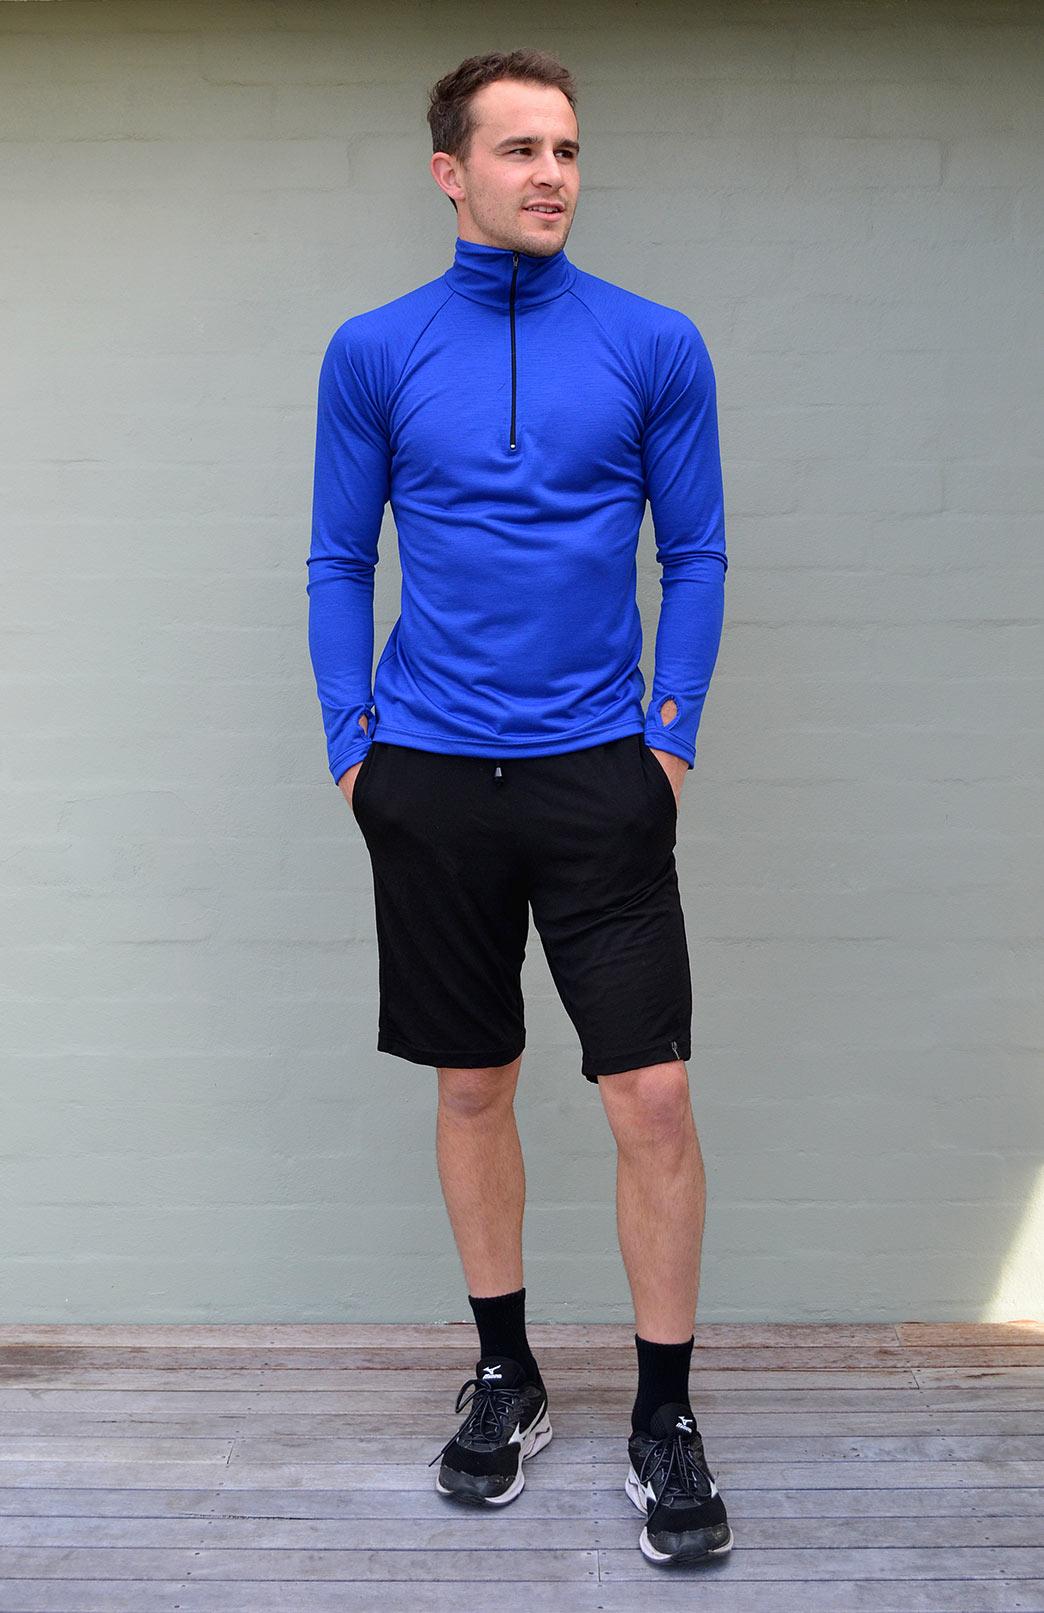 Men's Wool Shorts - Men's Black Merino Wool Sports and Outdoor Shorts - Smitten Merino Tasmania Australia